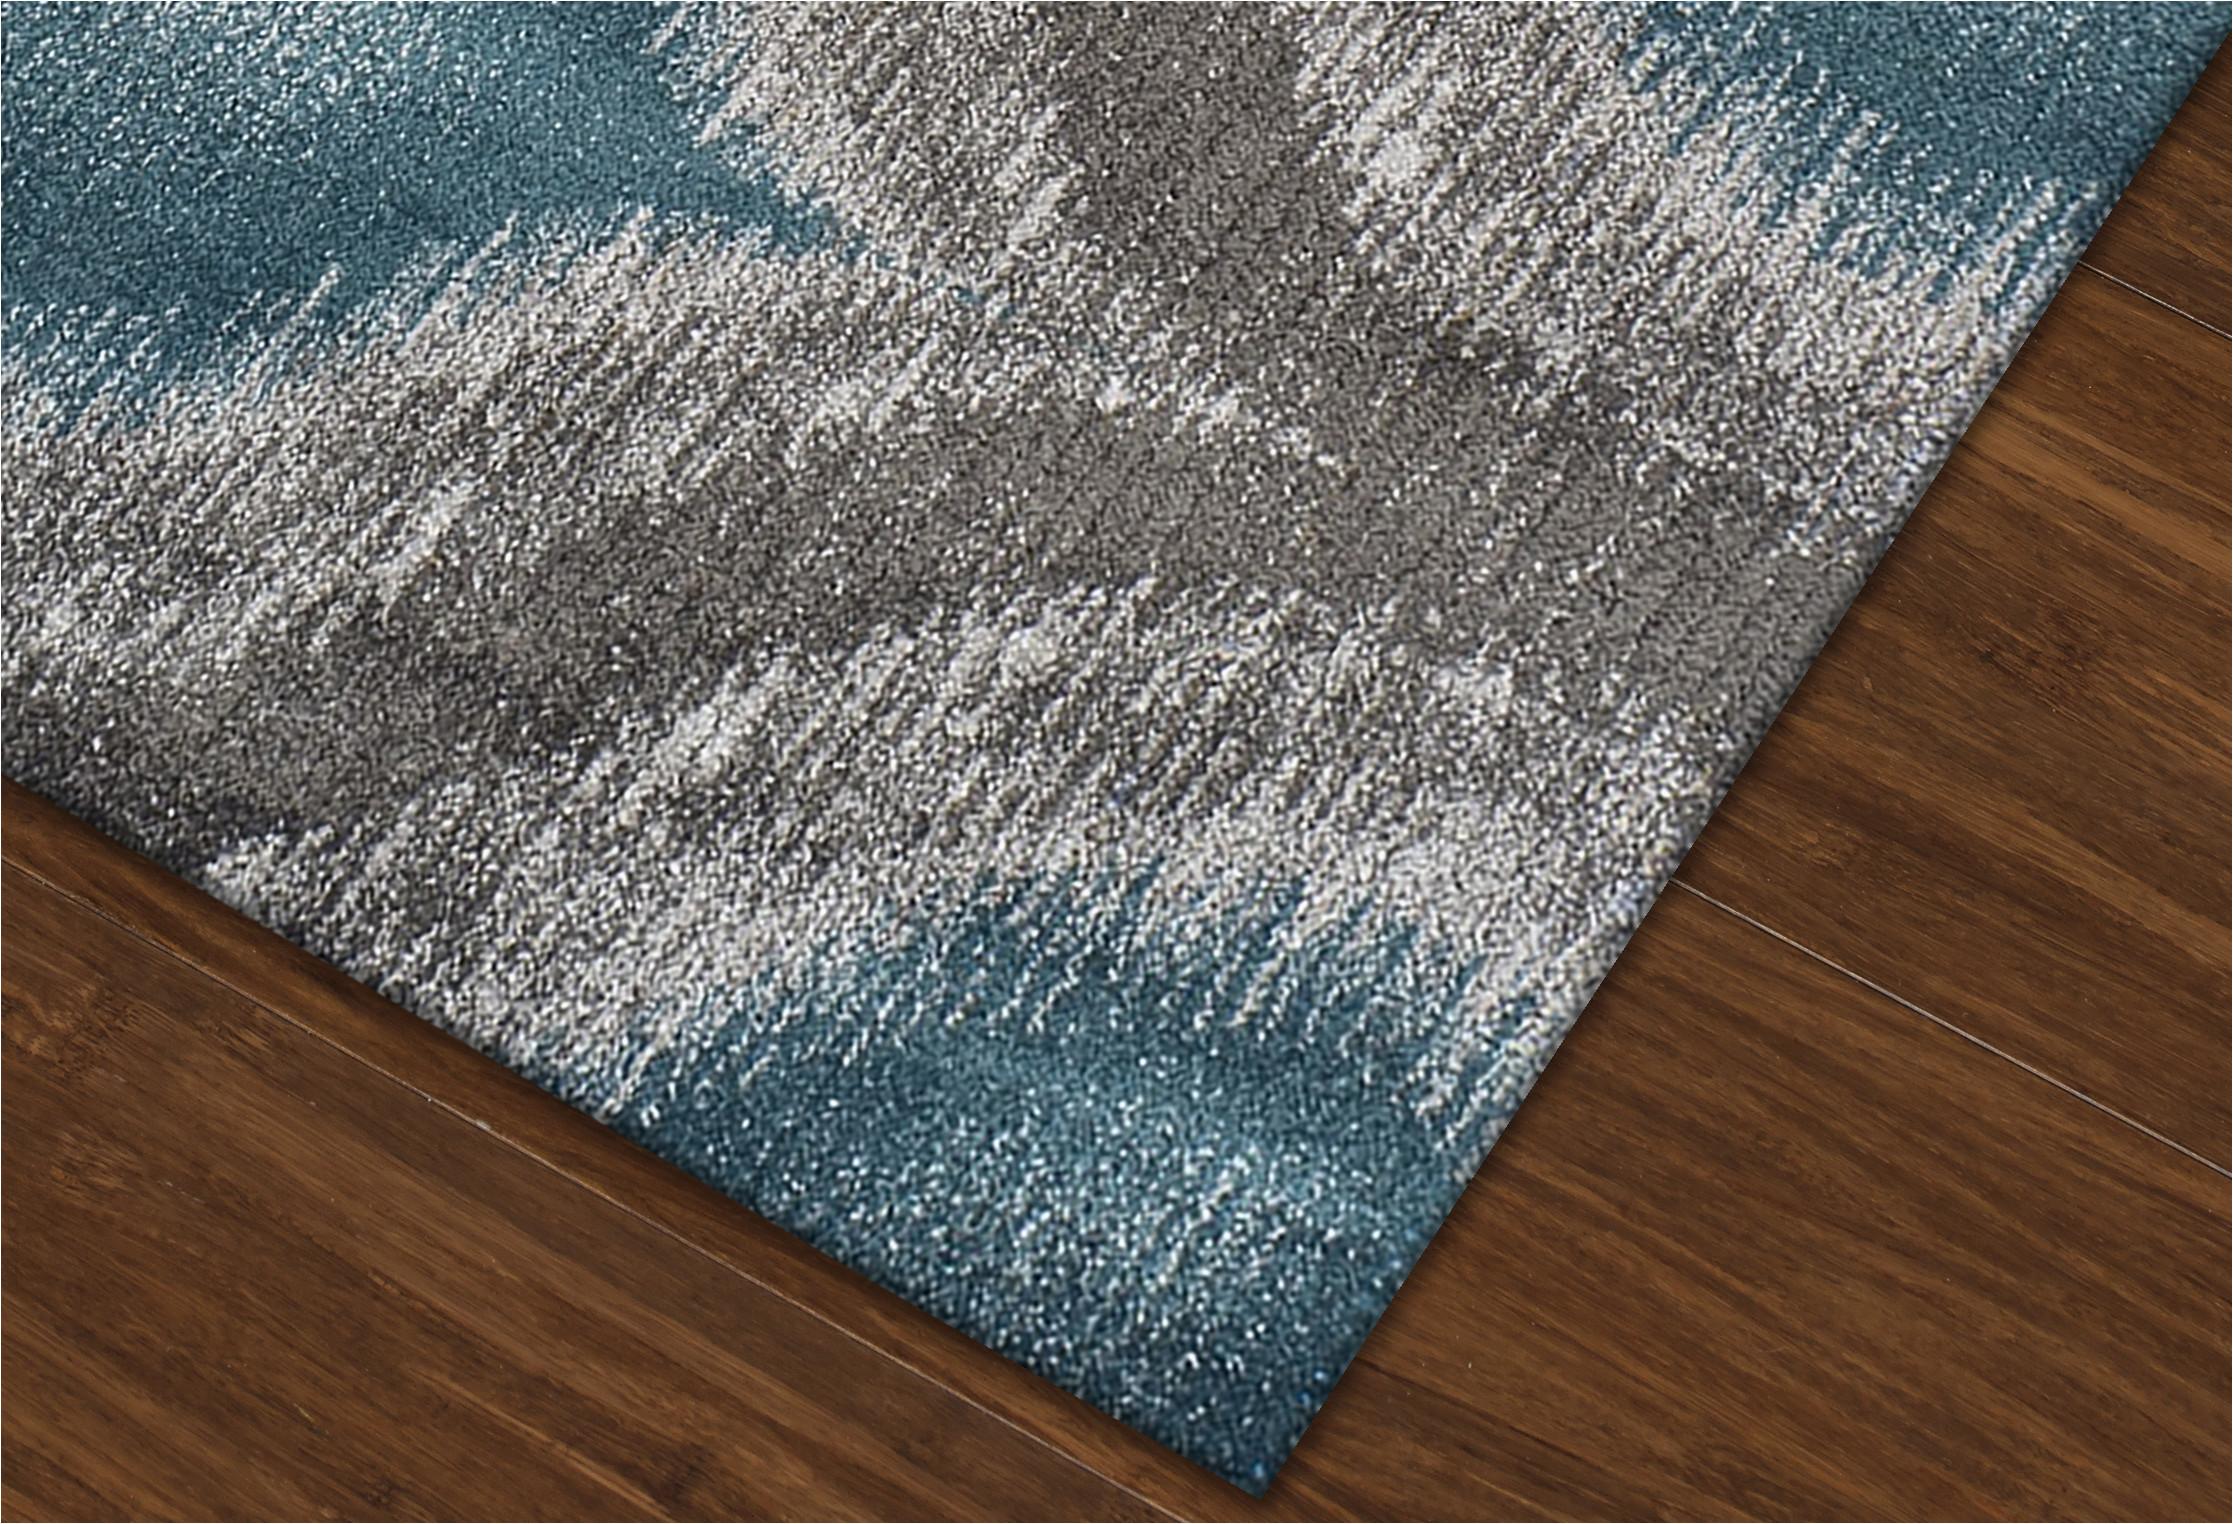 modern grey teal premium polypropylene rug p 1398